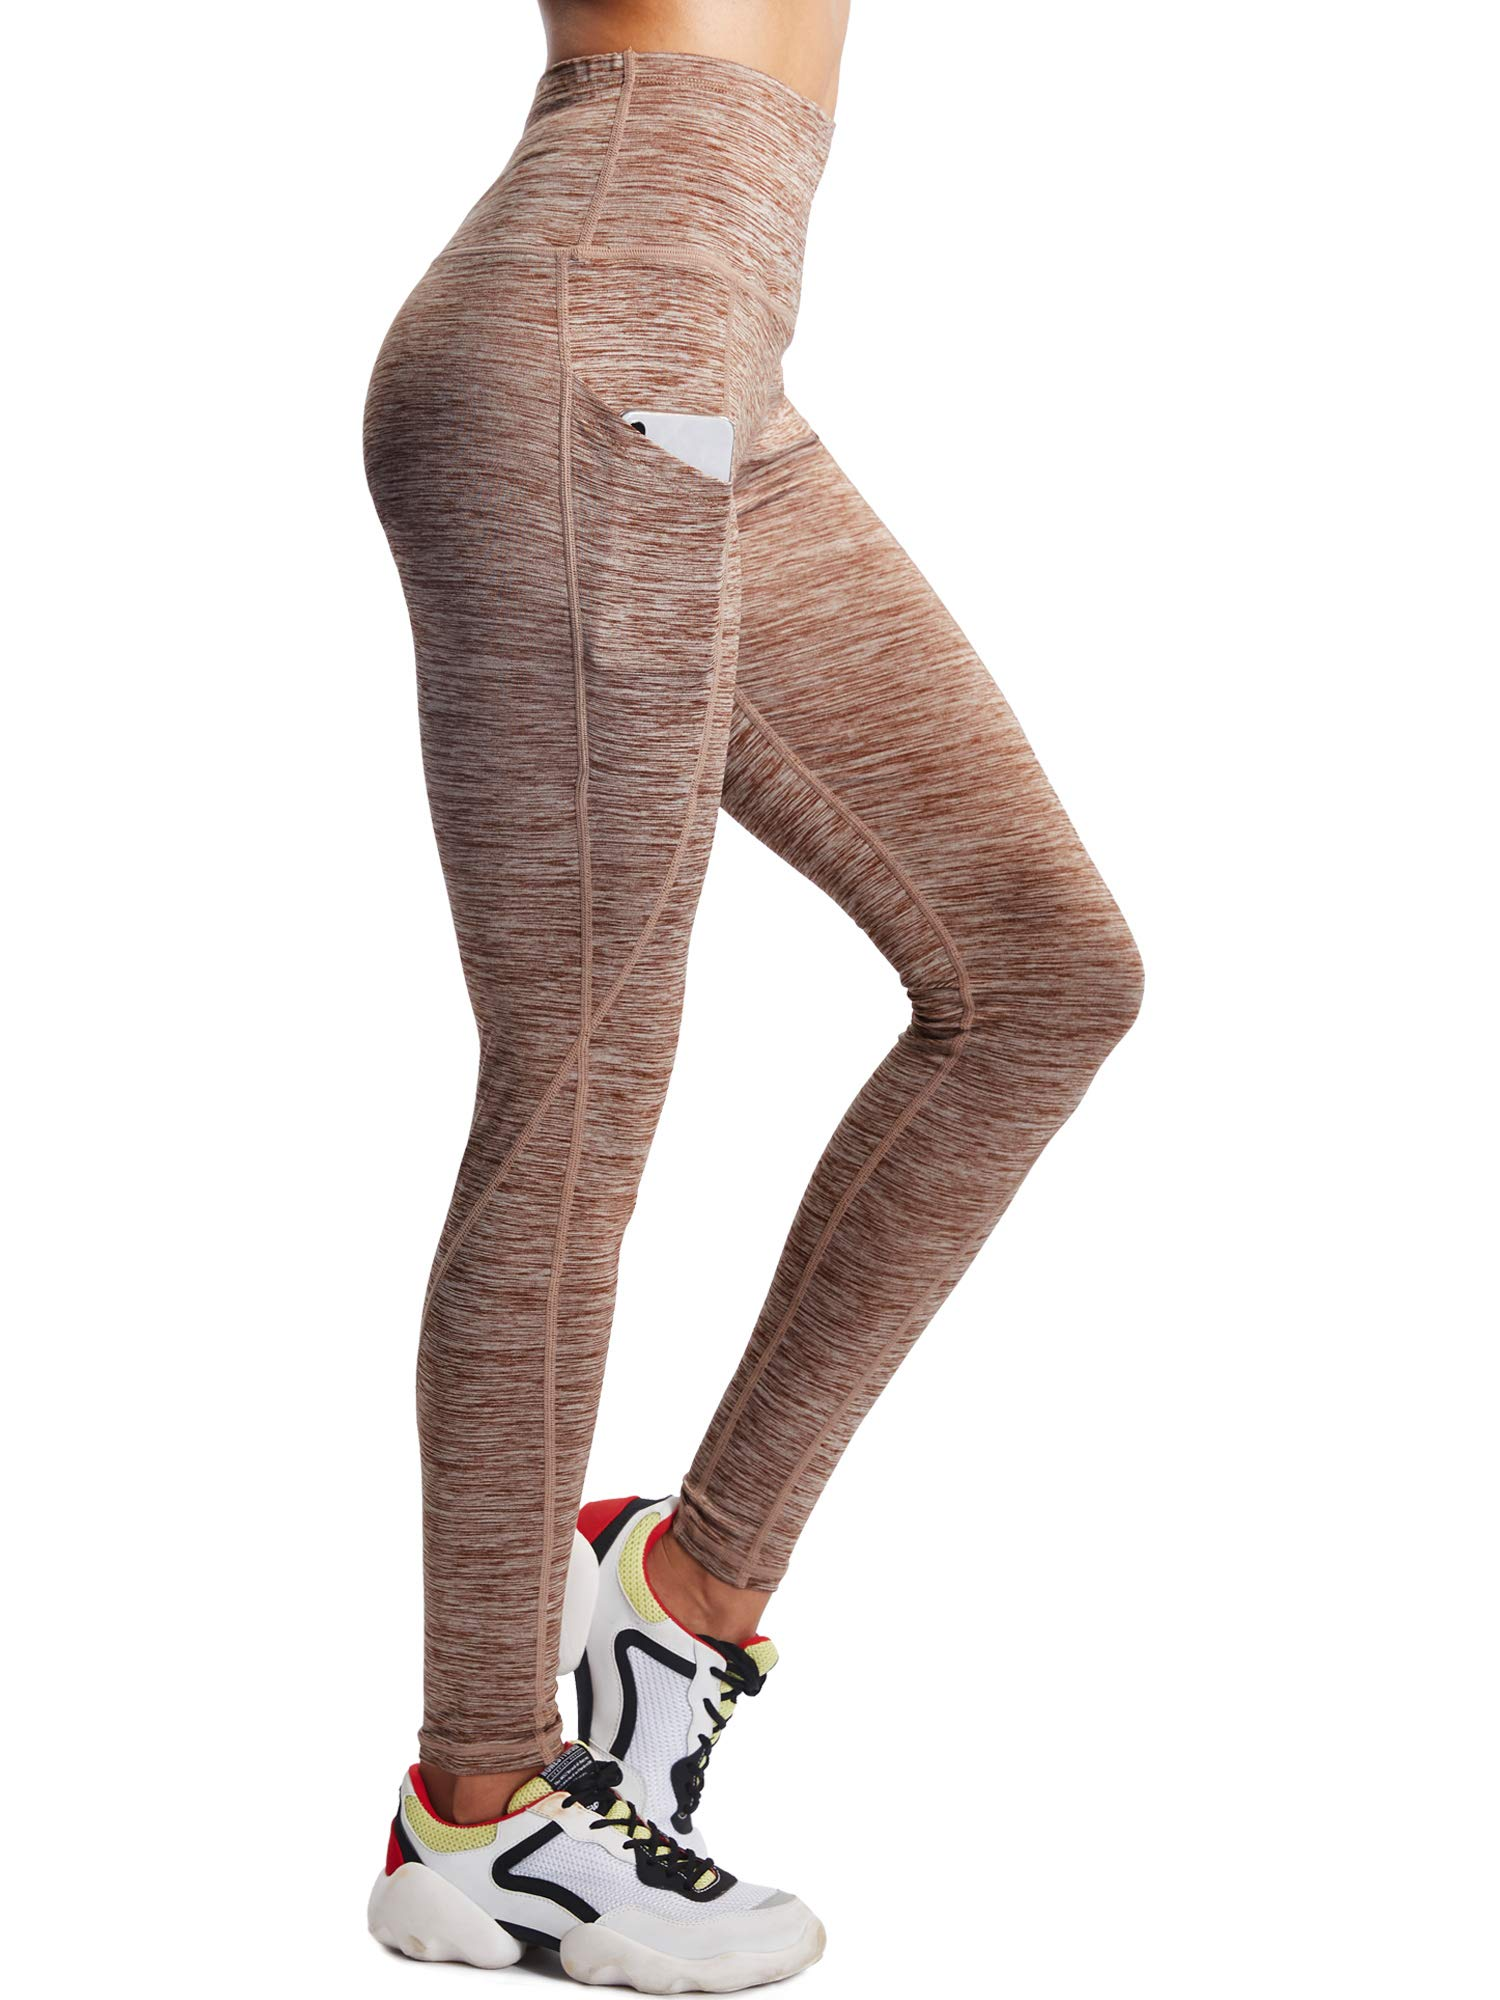 Neleus Tummy Control High Waist Workout Running Leggings for Women,9033,One Piece,Brown,M,EU L by Neleus